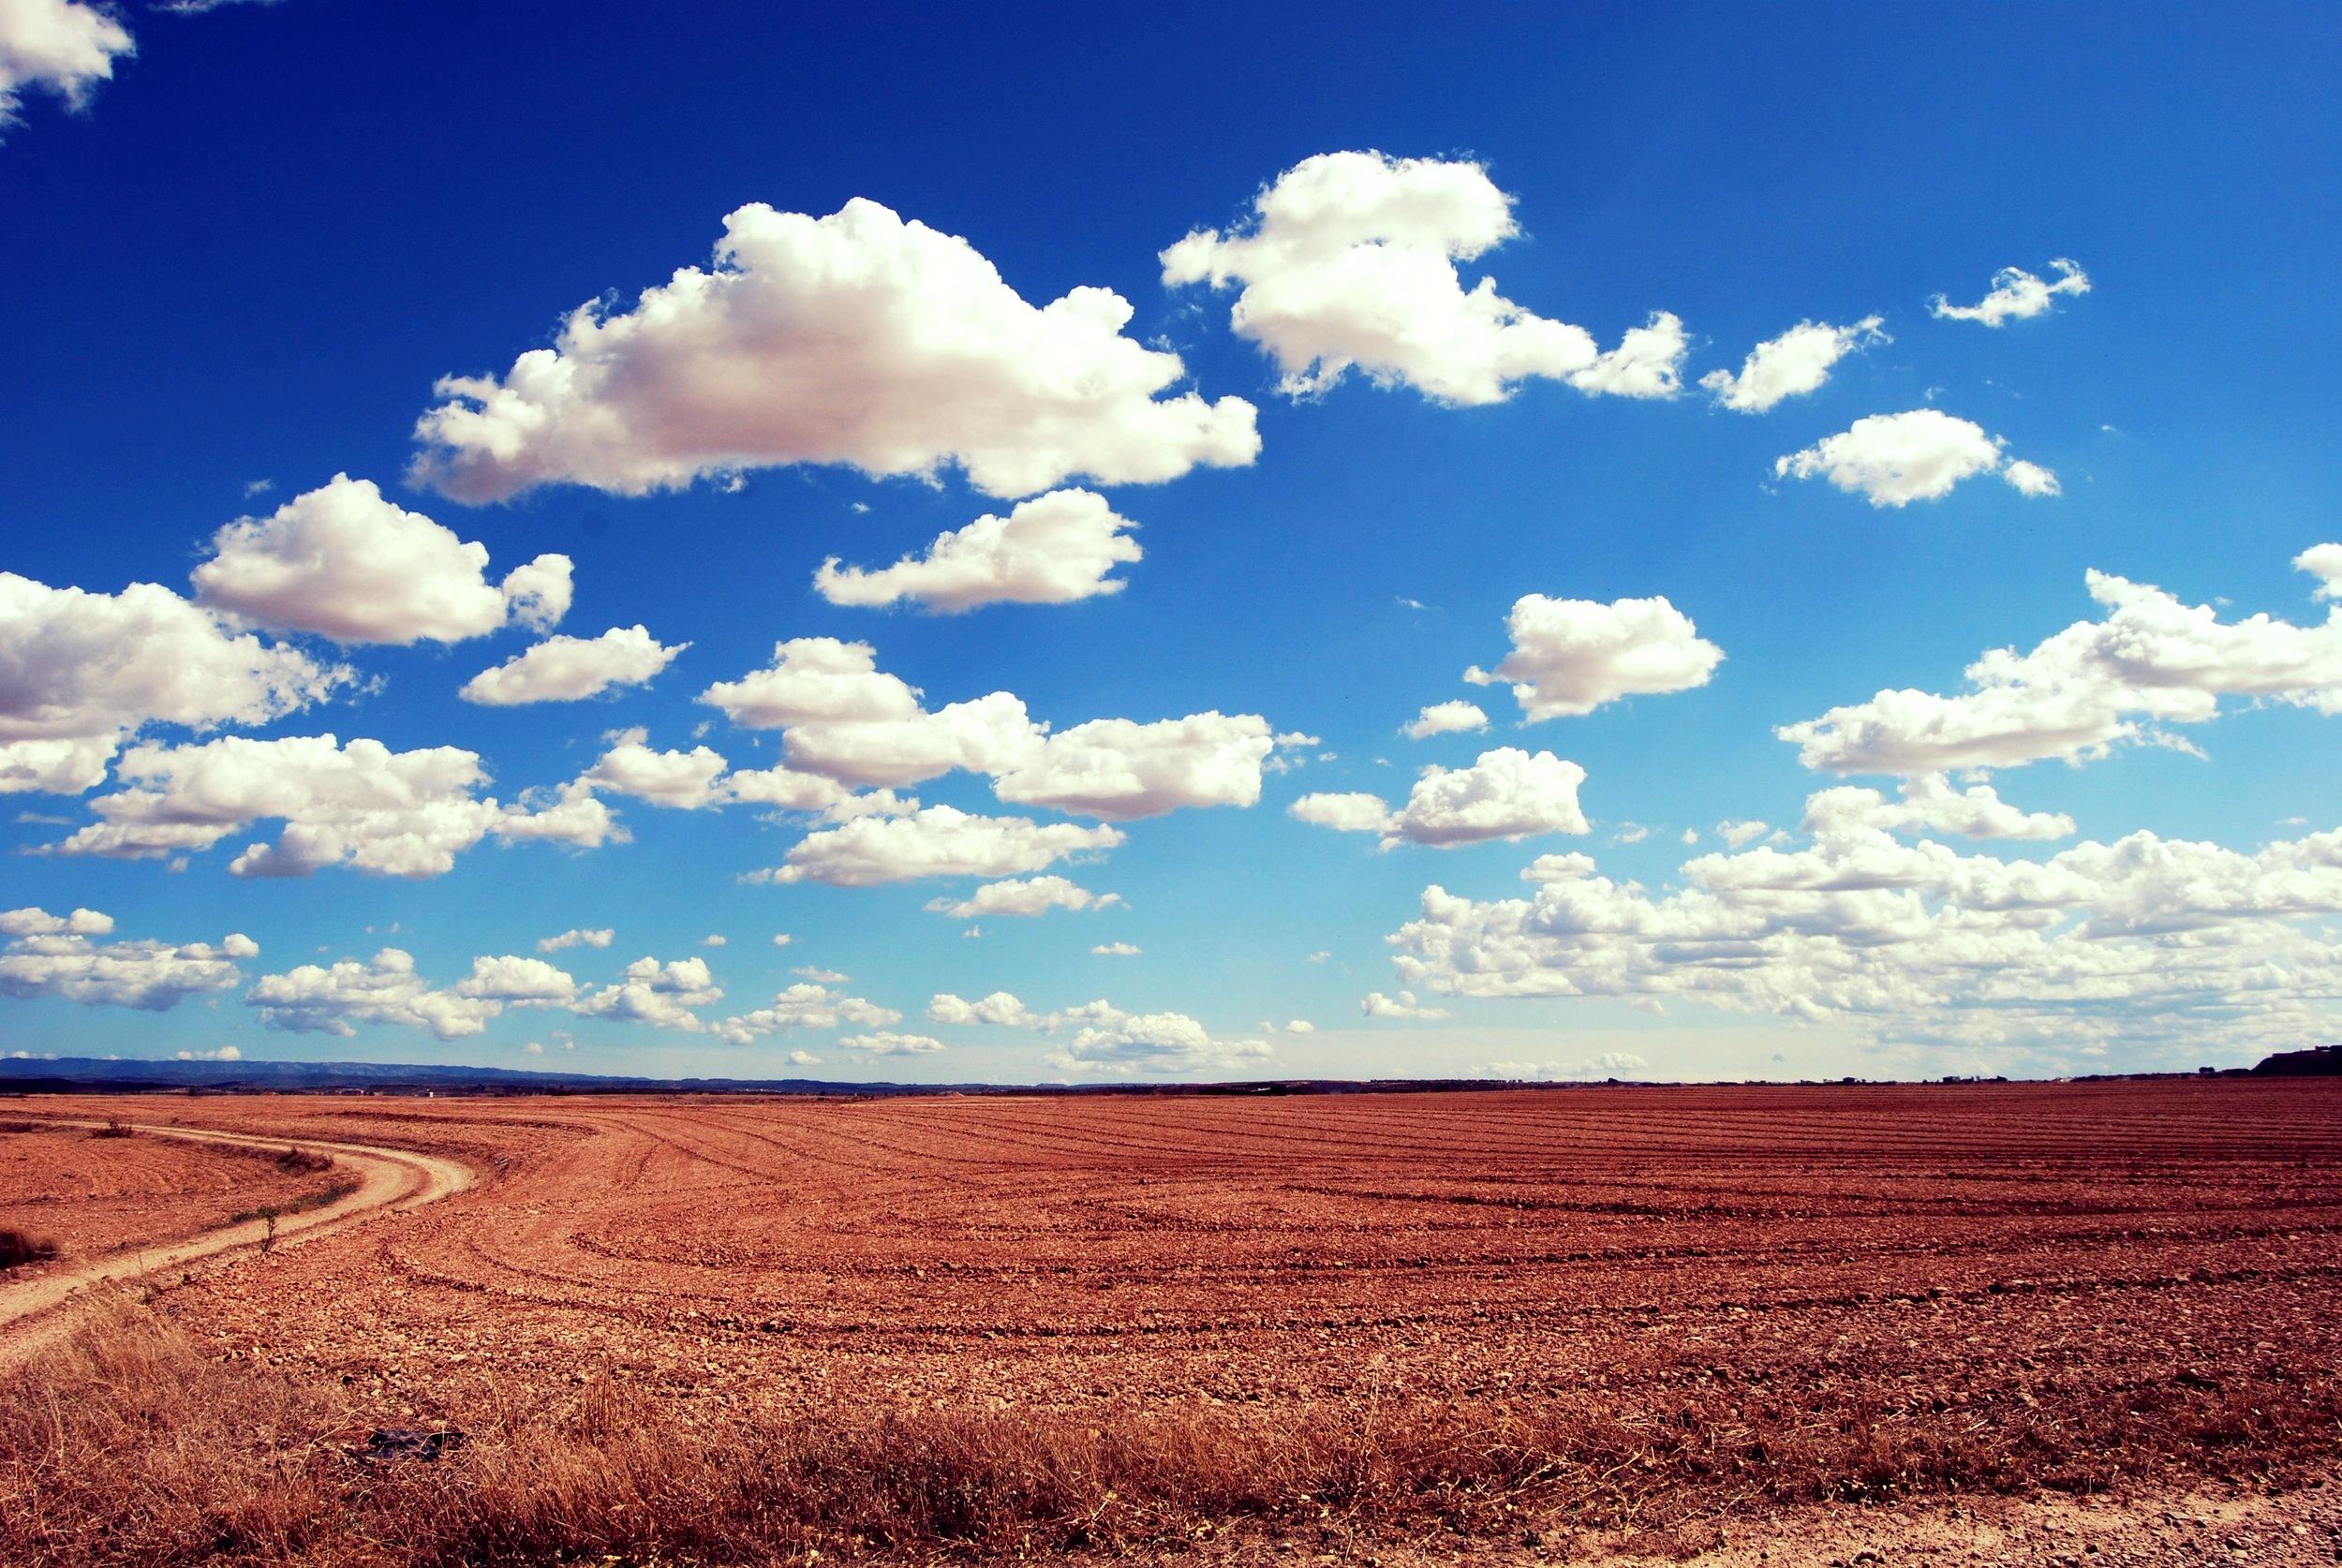 clouds-sky-earth-46160.jpg